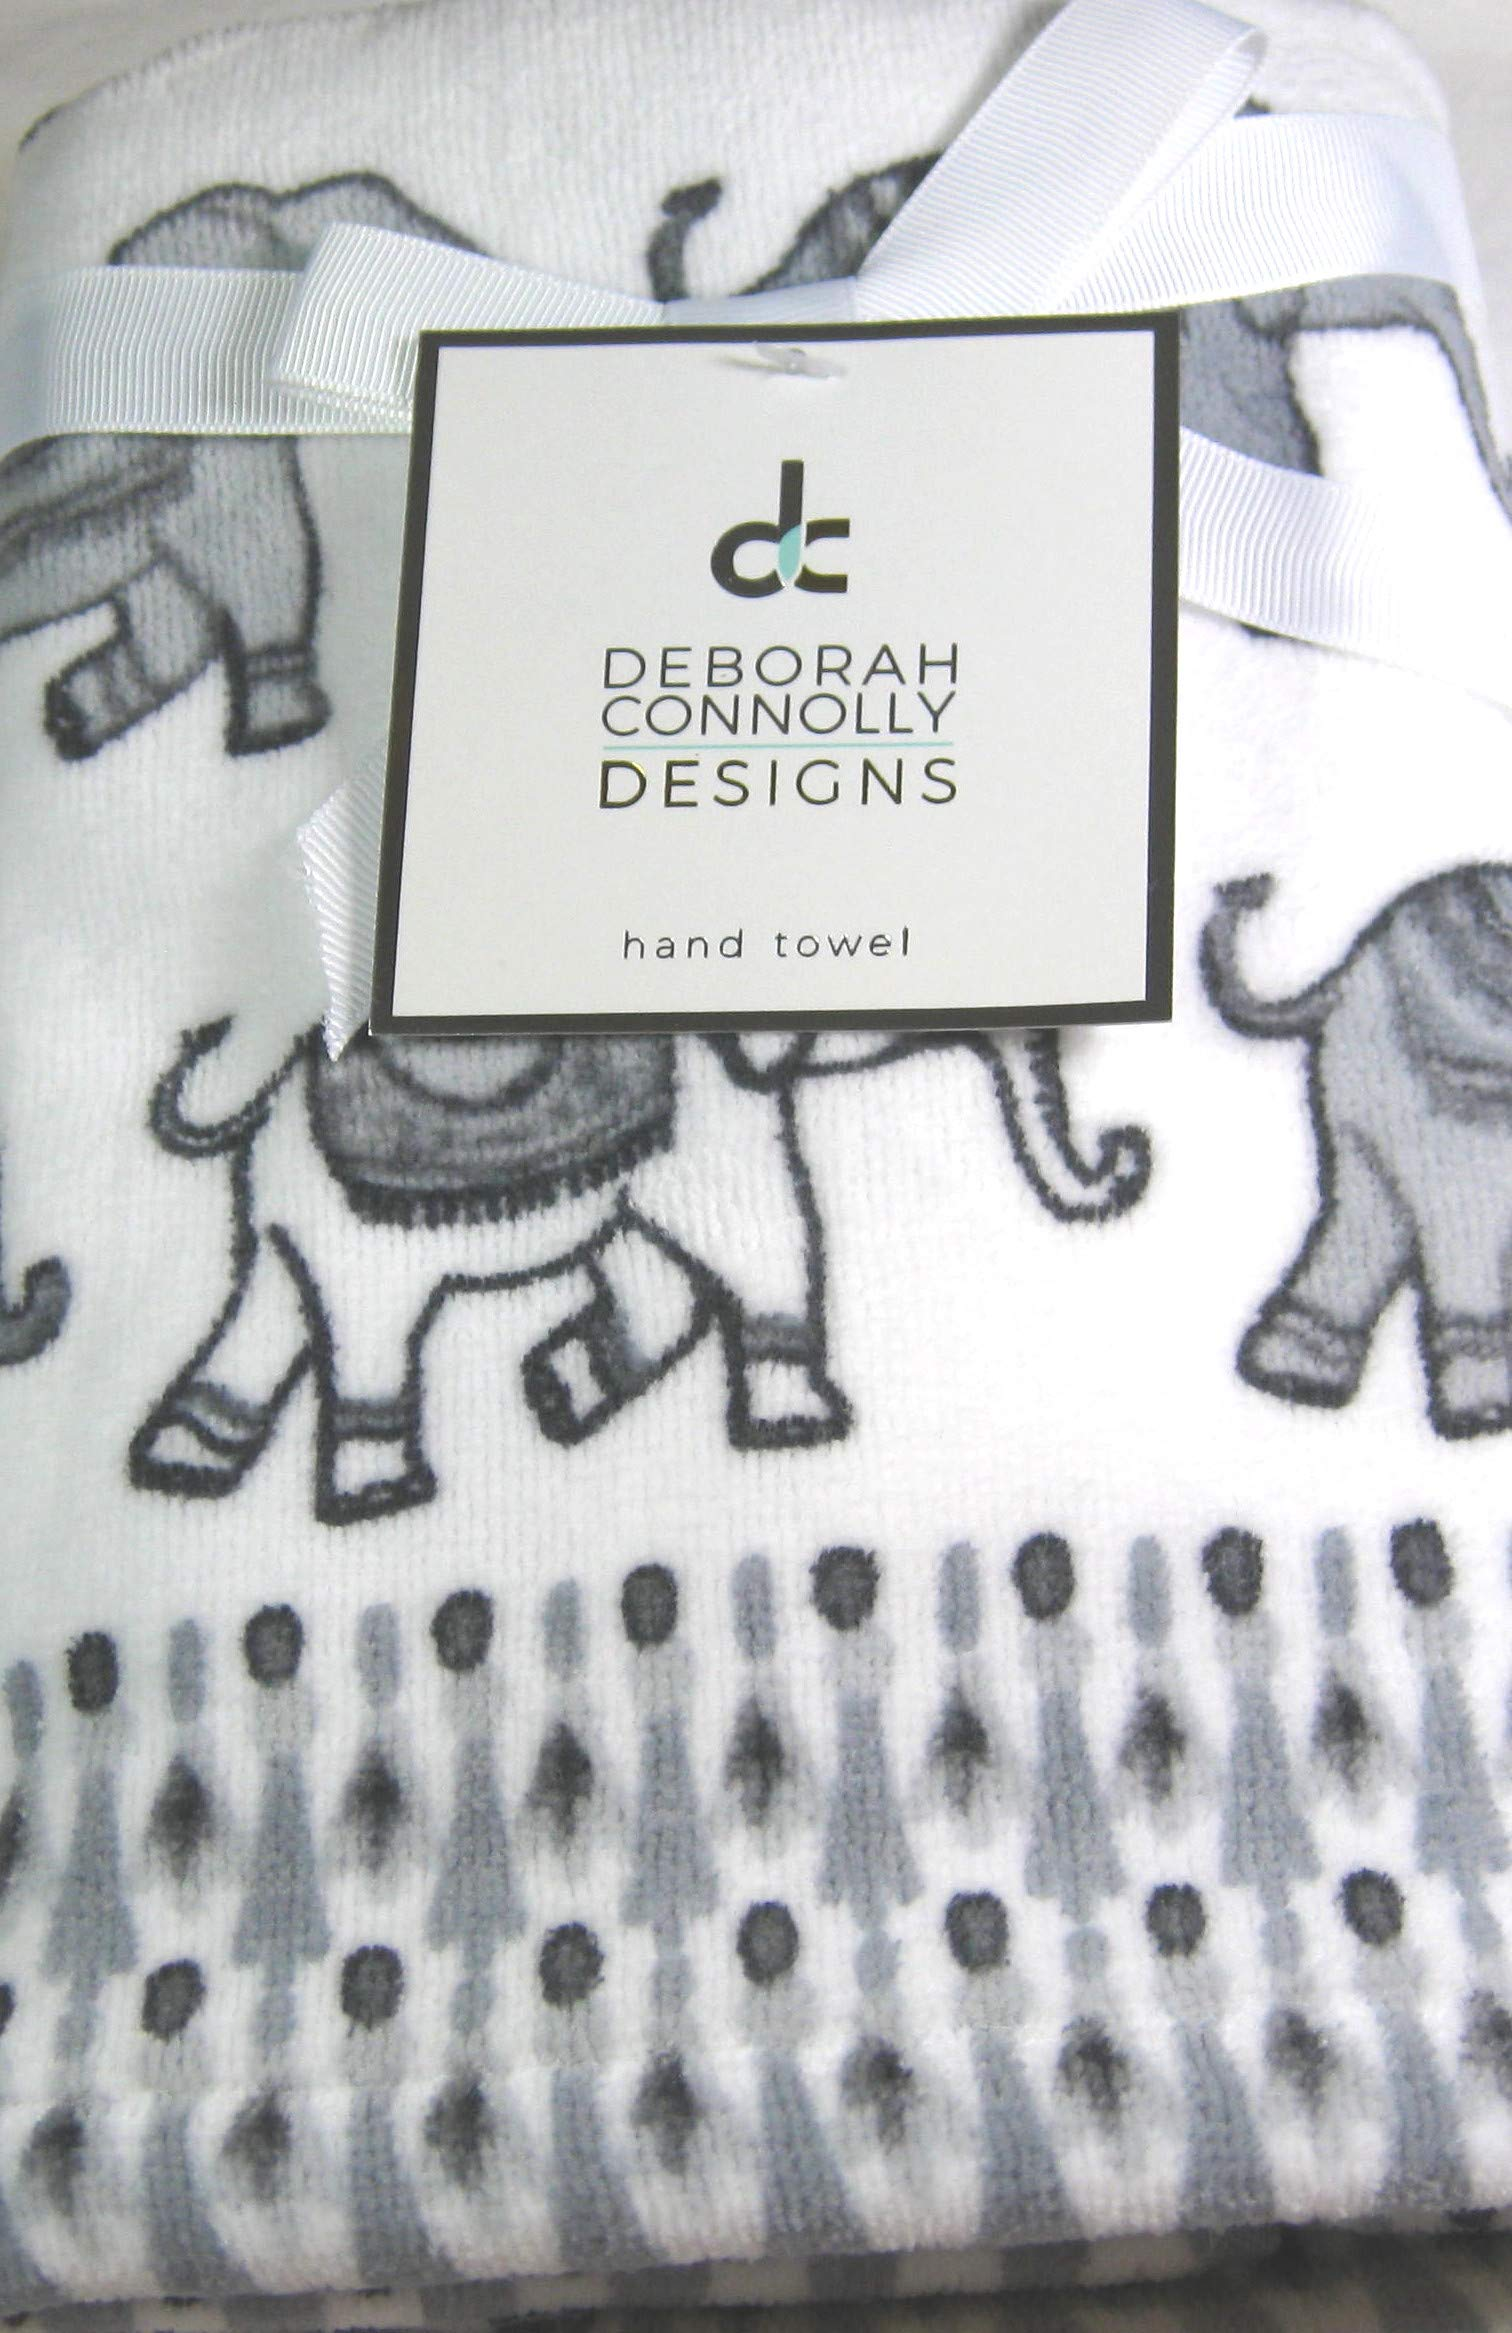 Set of 2 Decorative, Soft, Plush, Absorbent Hand Towels Parade of Elephants 100% Cotton